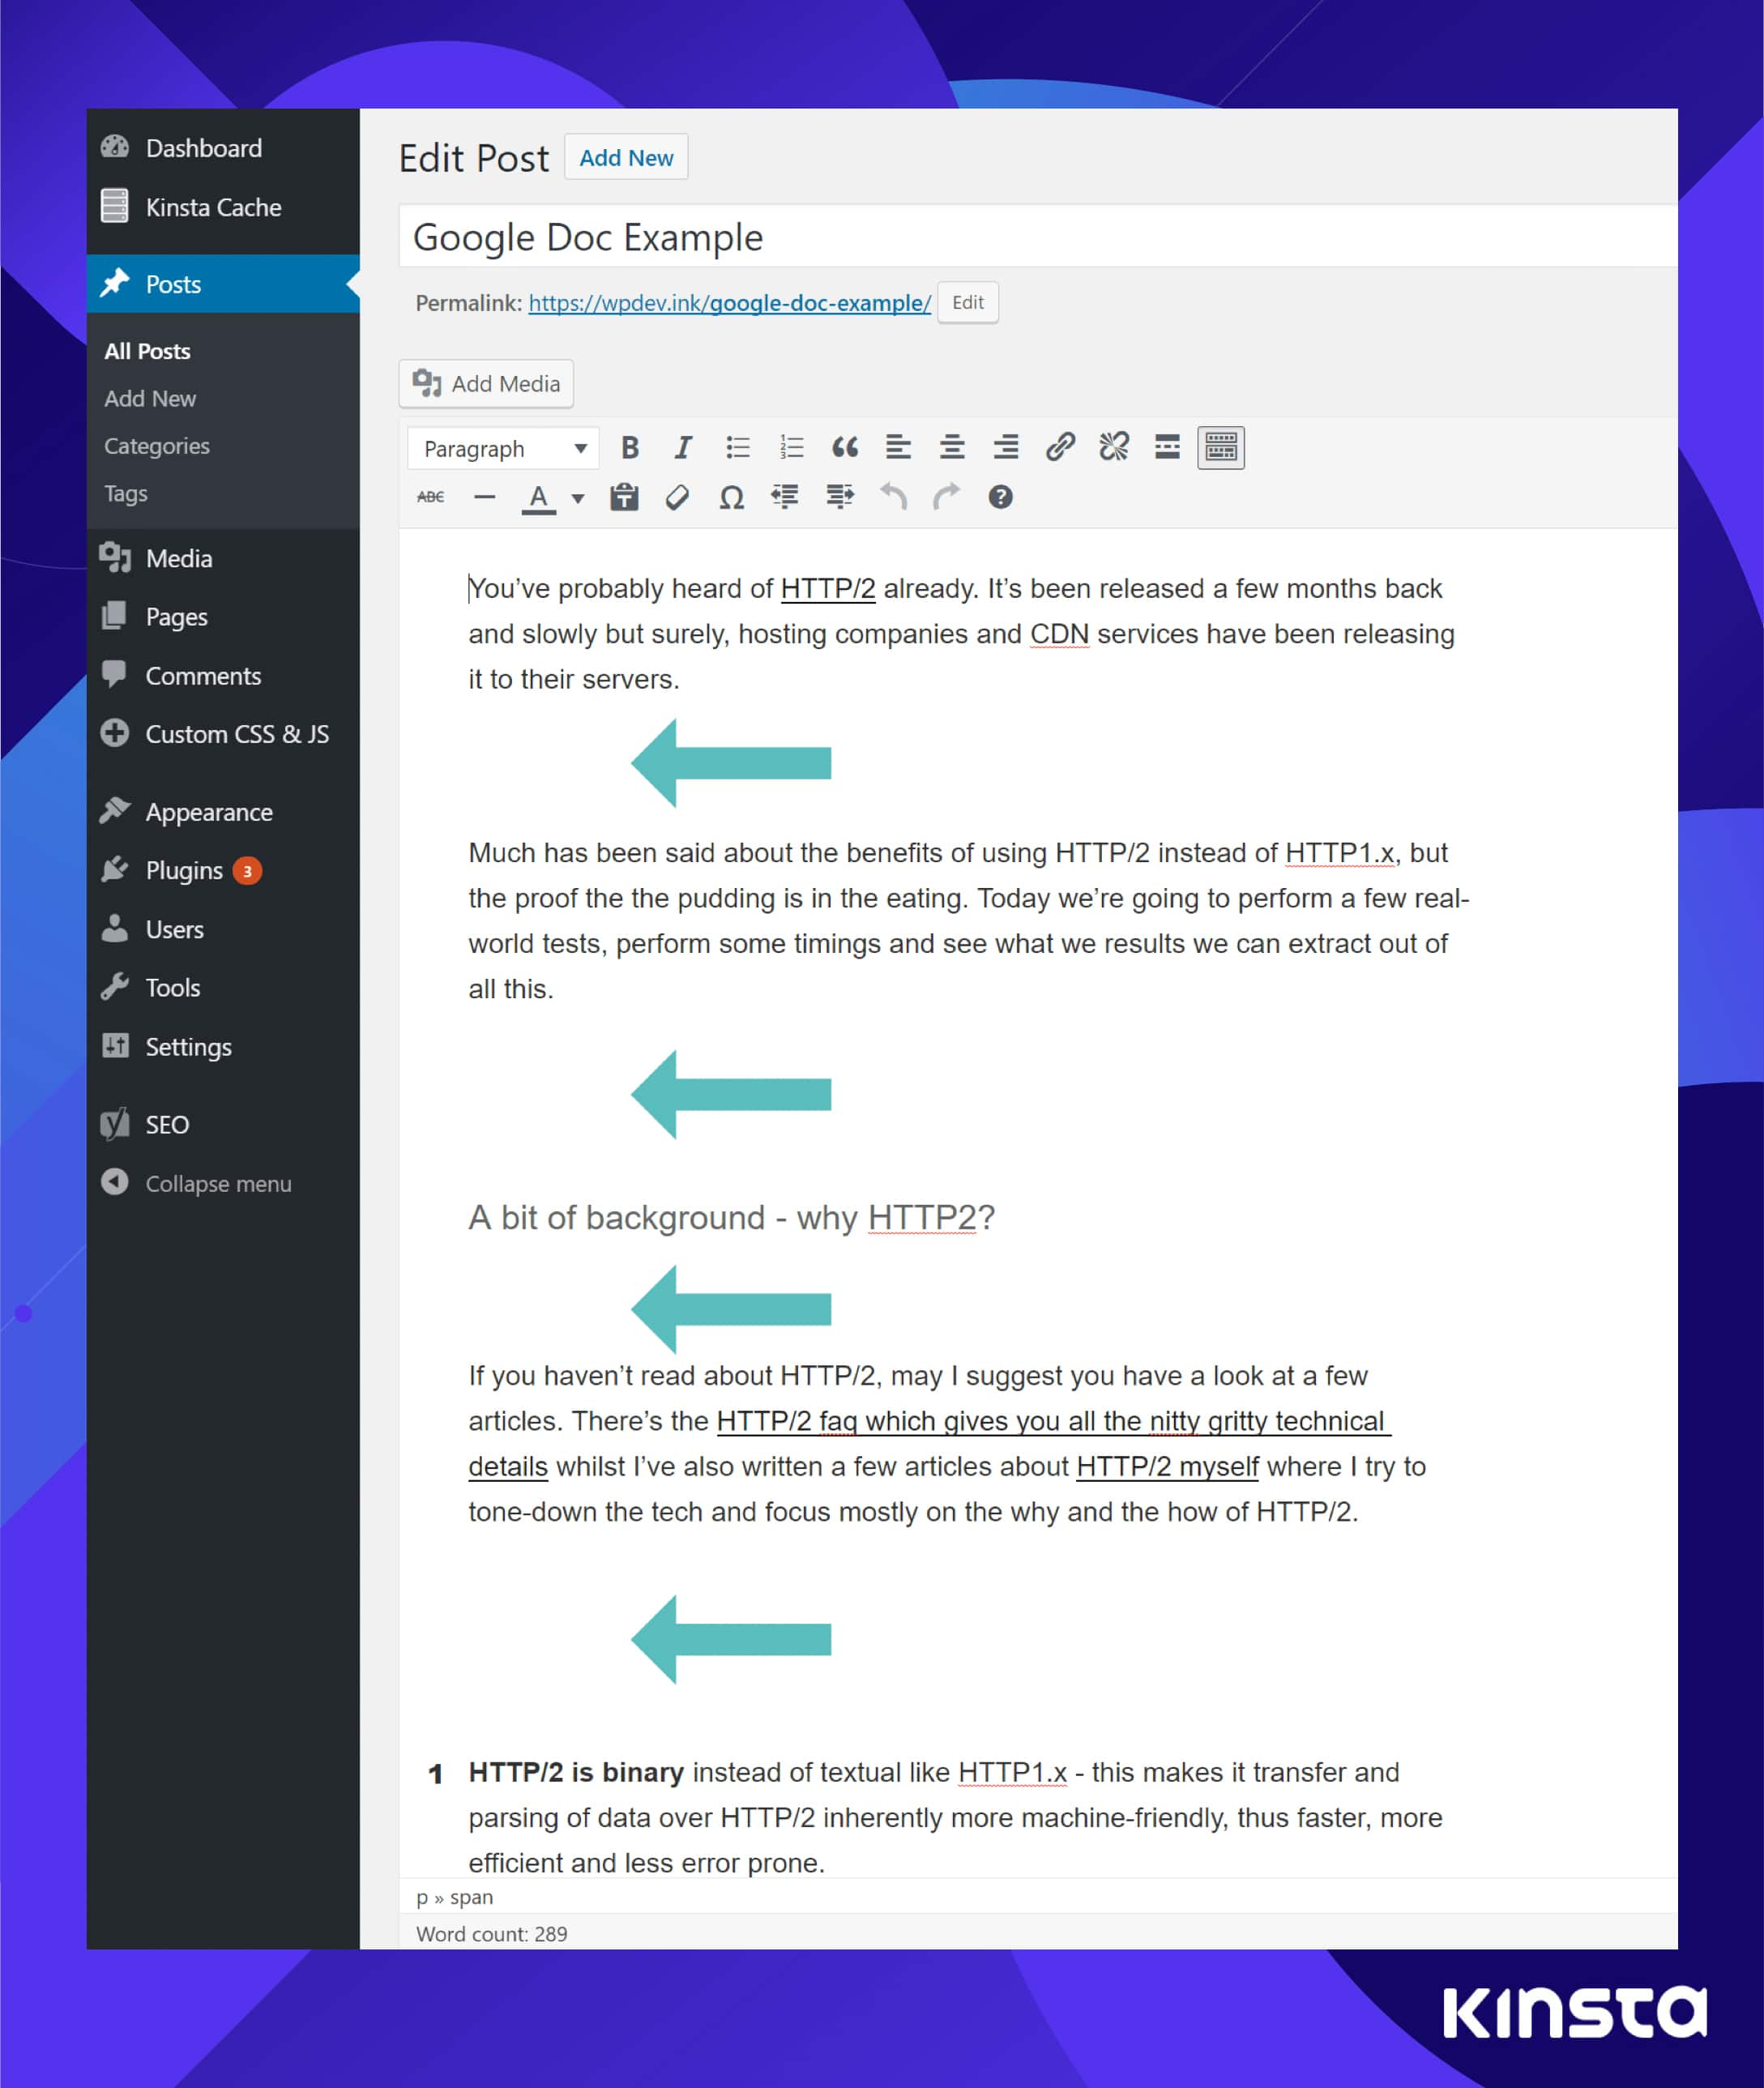 Google Docs to WordPress spacing issue